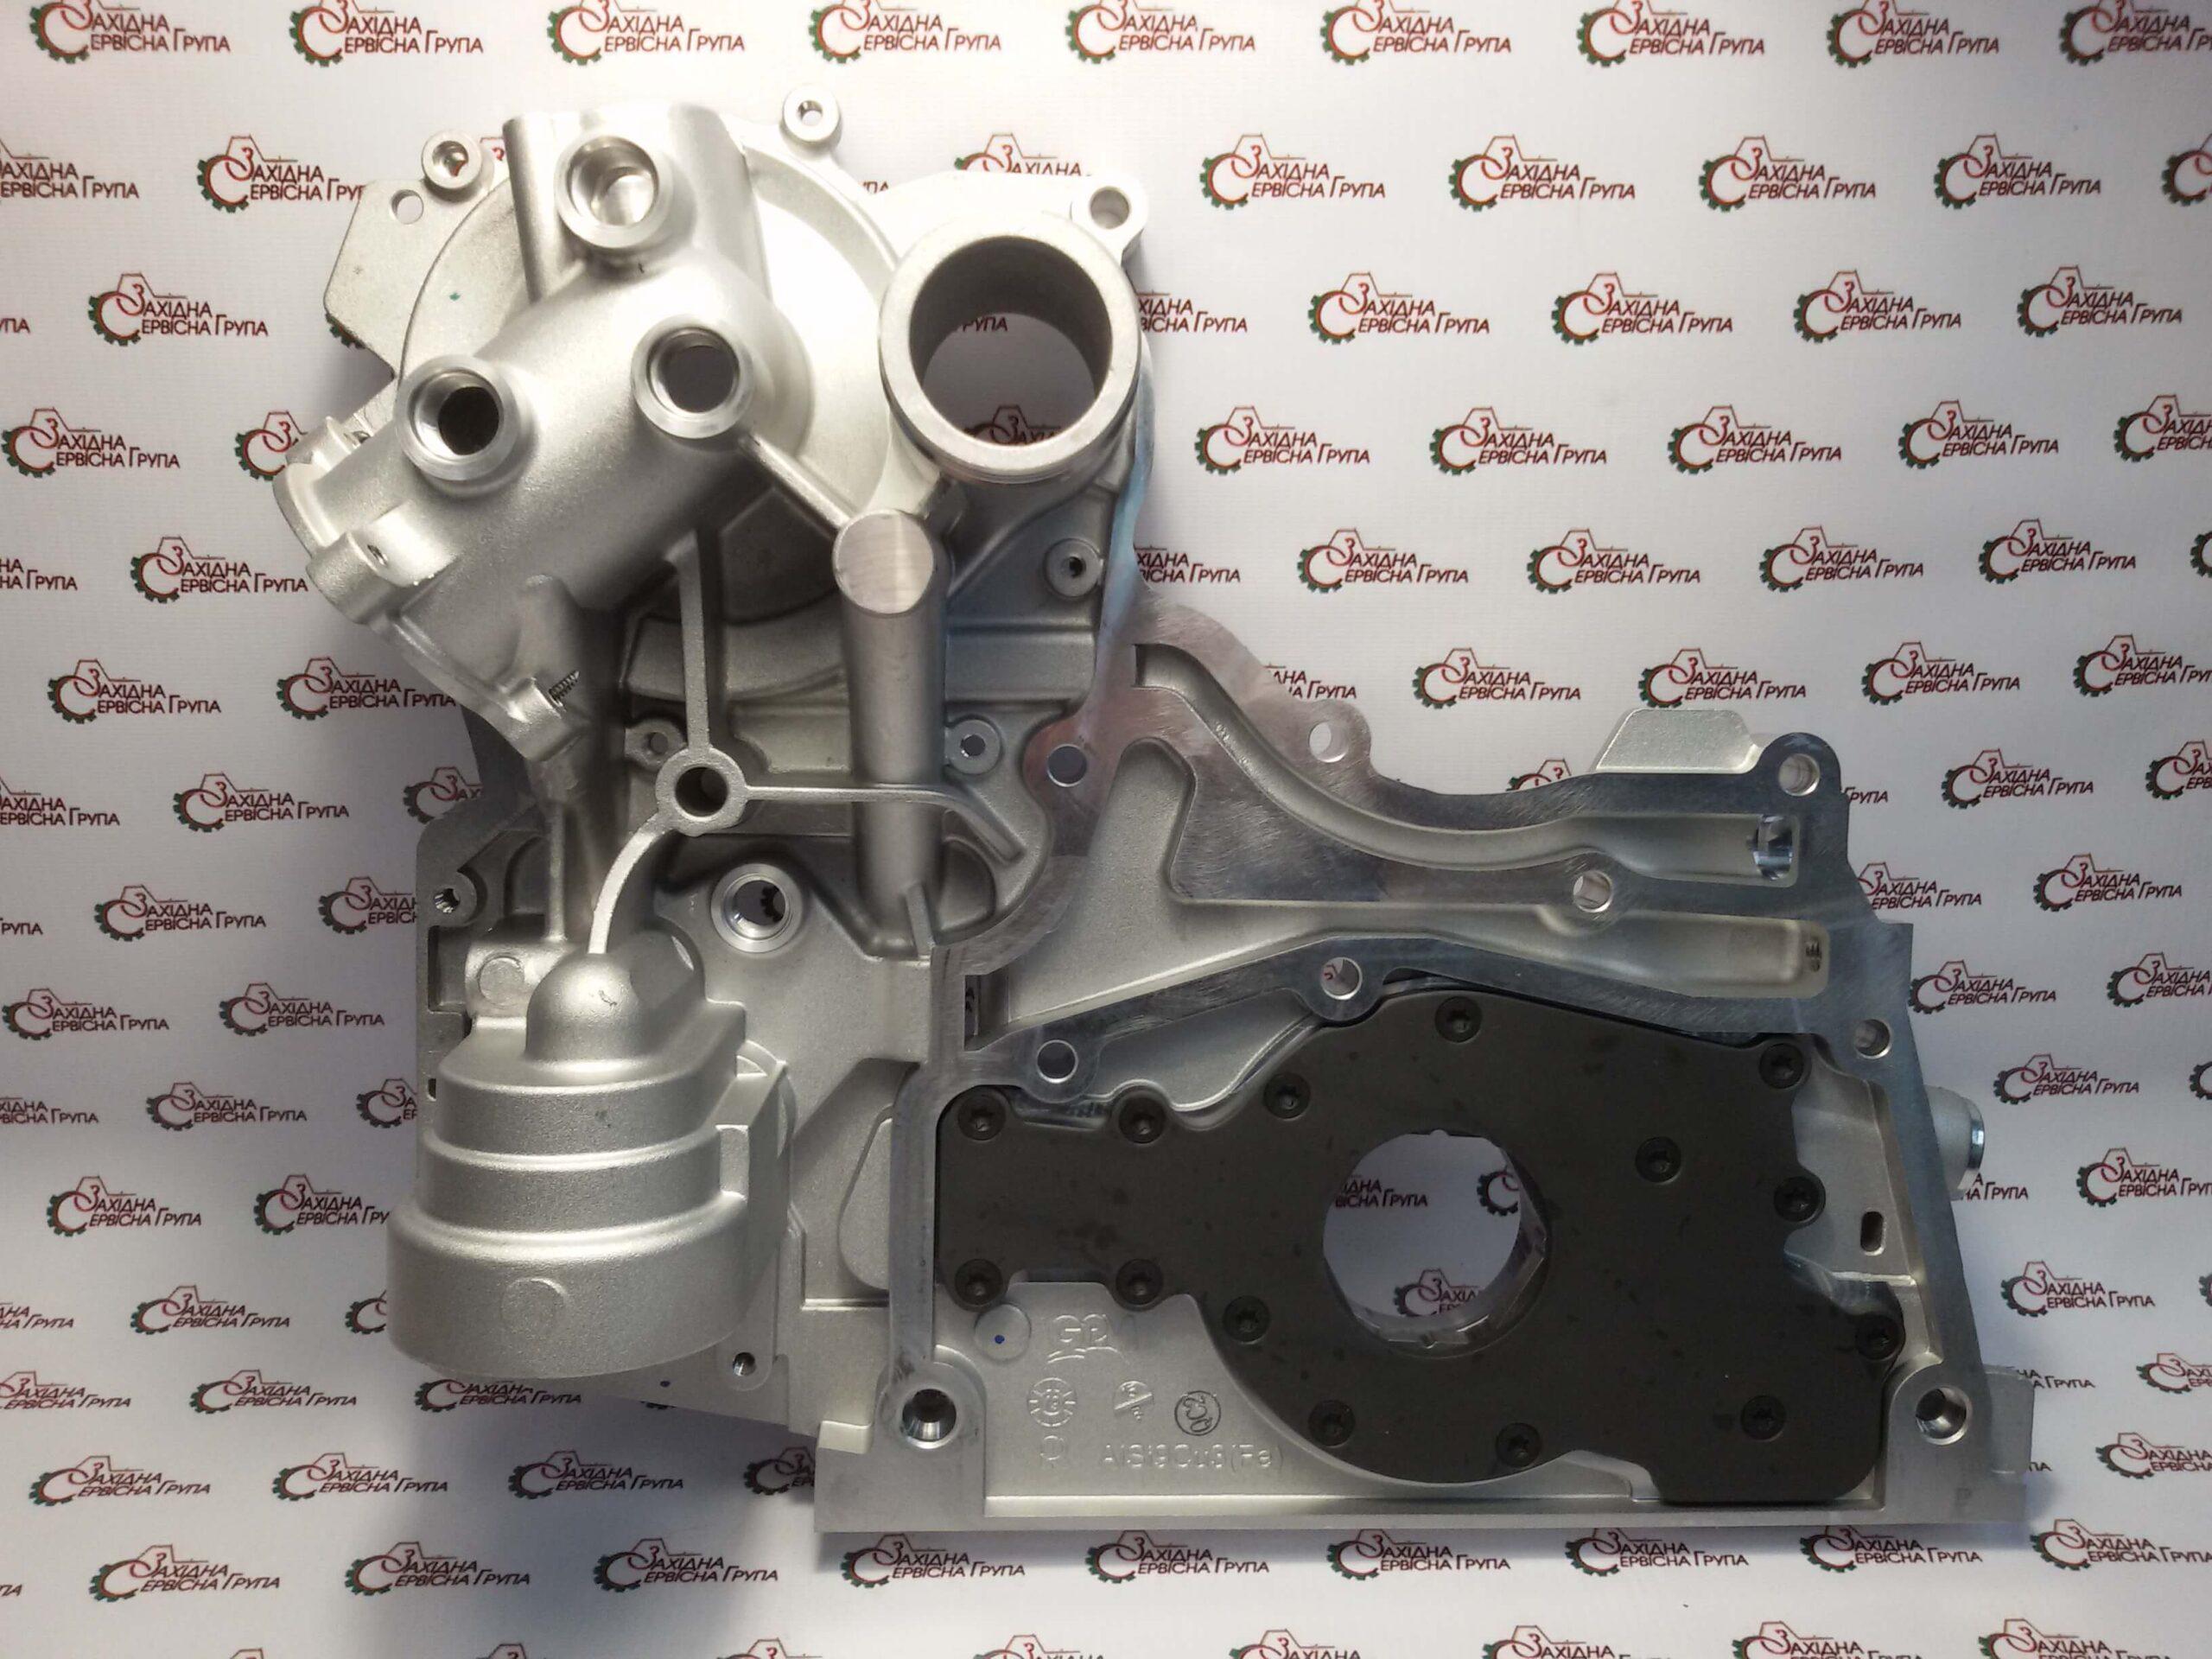 Кришка двигуна передня / насос масляний Cummins ISF 2.8, 5475199, 5569572, 5302888, 5302887, 5274914, 5269789.